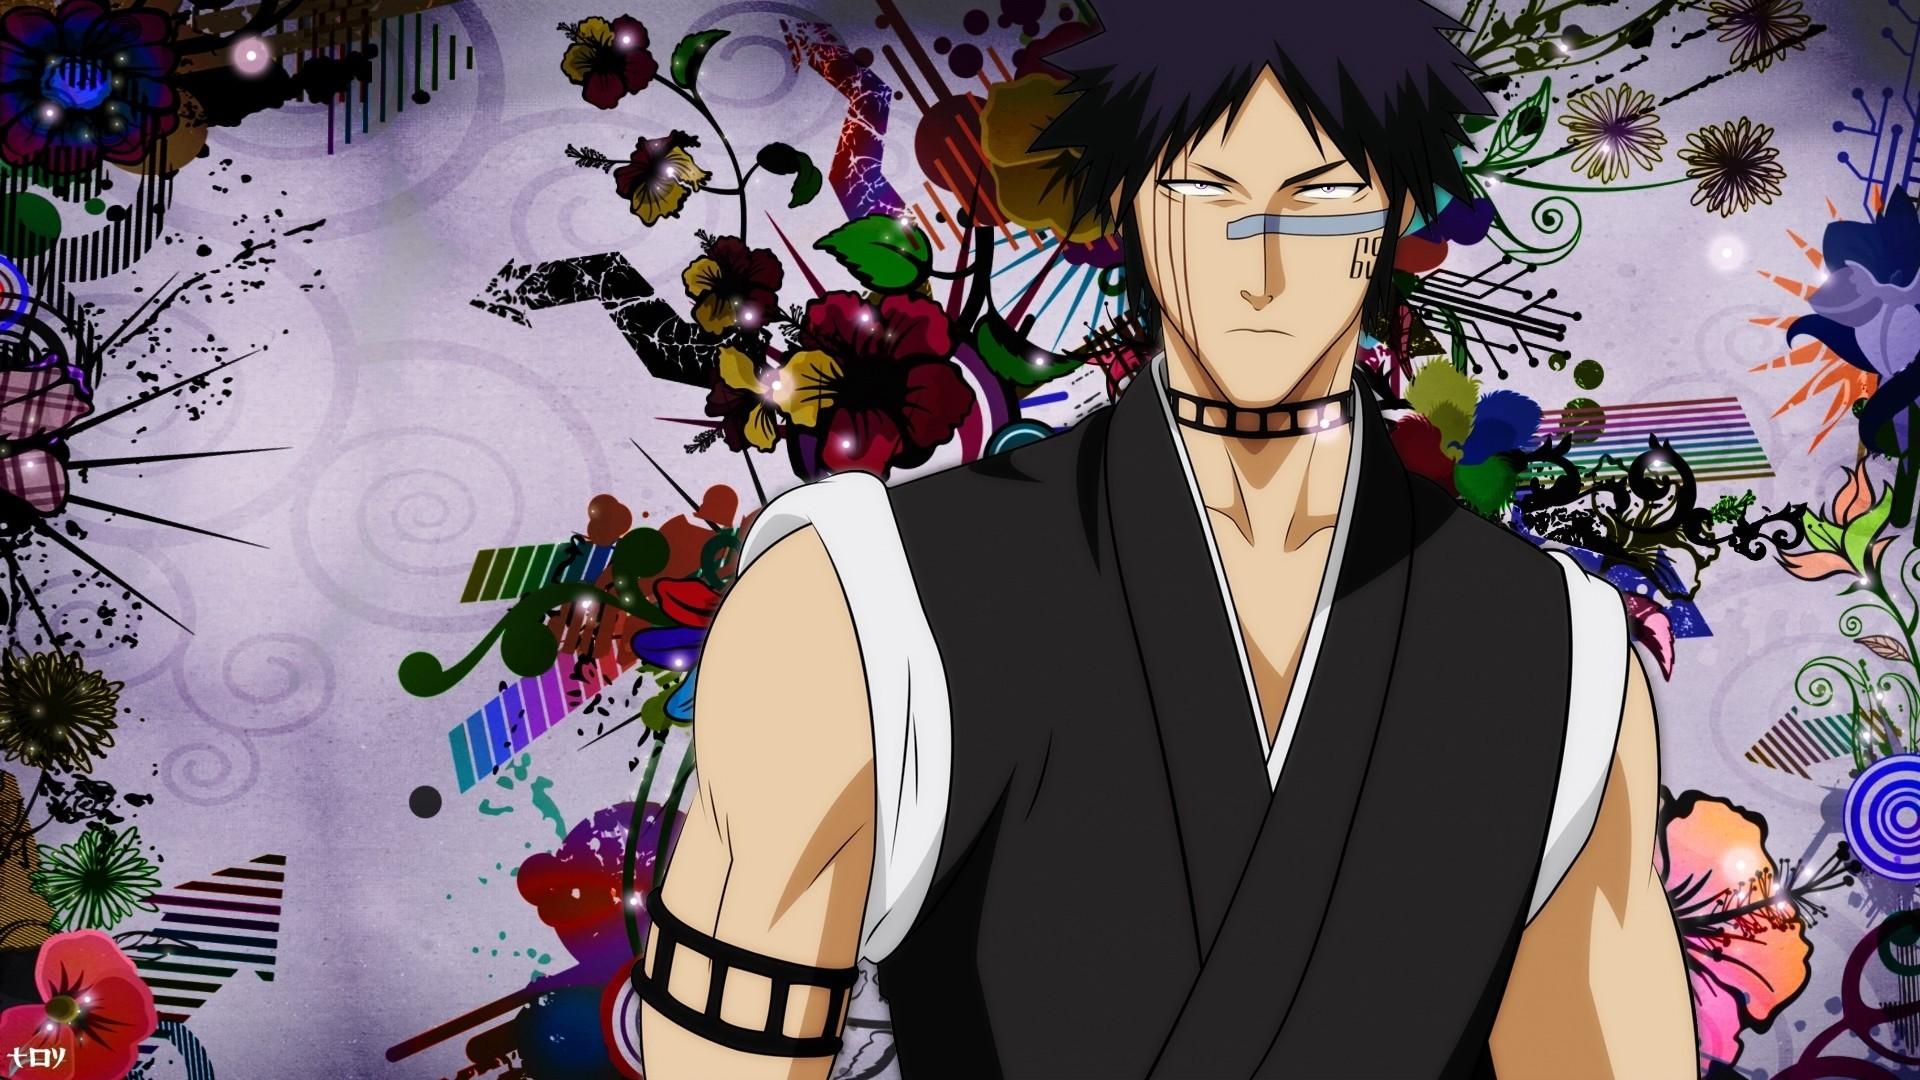 Shuhei Hisagi Full HD Wallpaper And Background Image